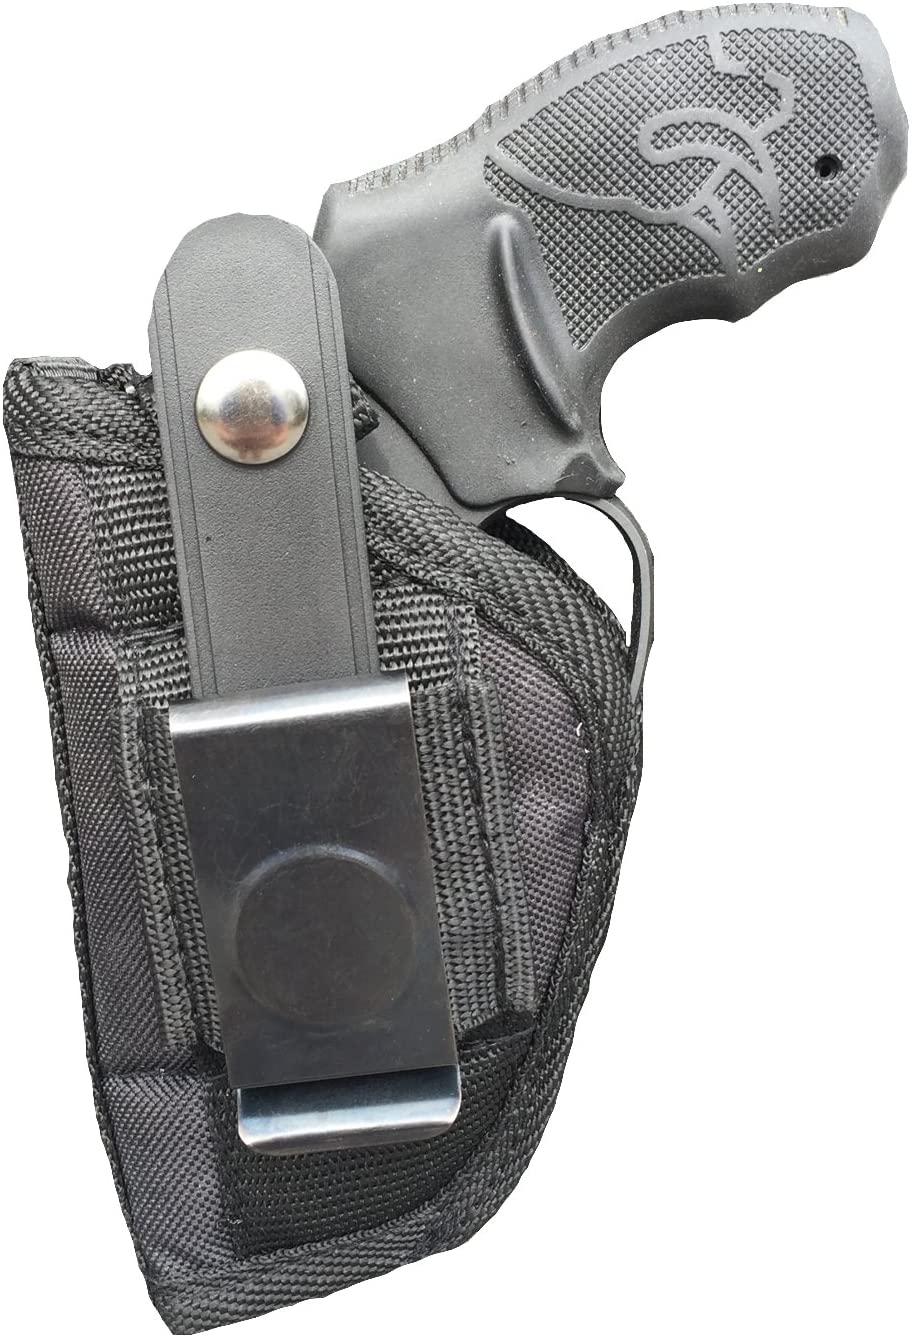 Nylon Belt or Clip on Gun Holster Fits Taurus Judge 4510 TKR, 431, 605 (5 Shot) with 3